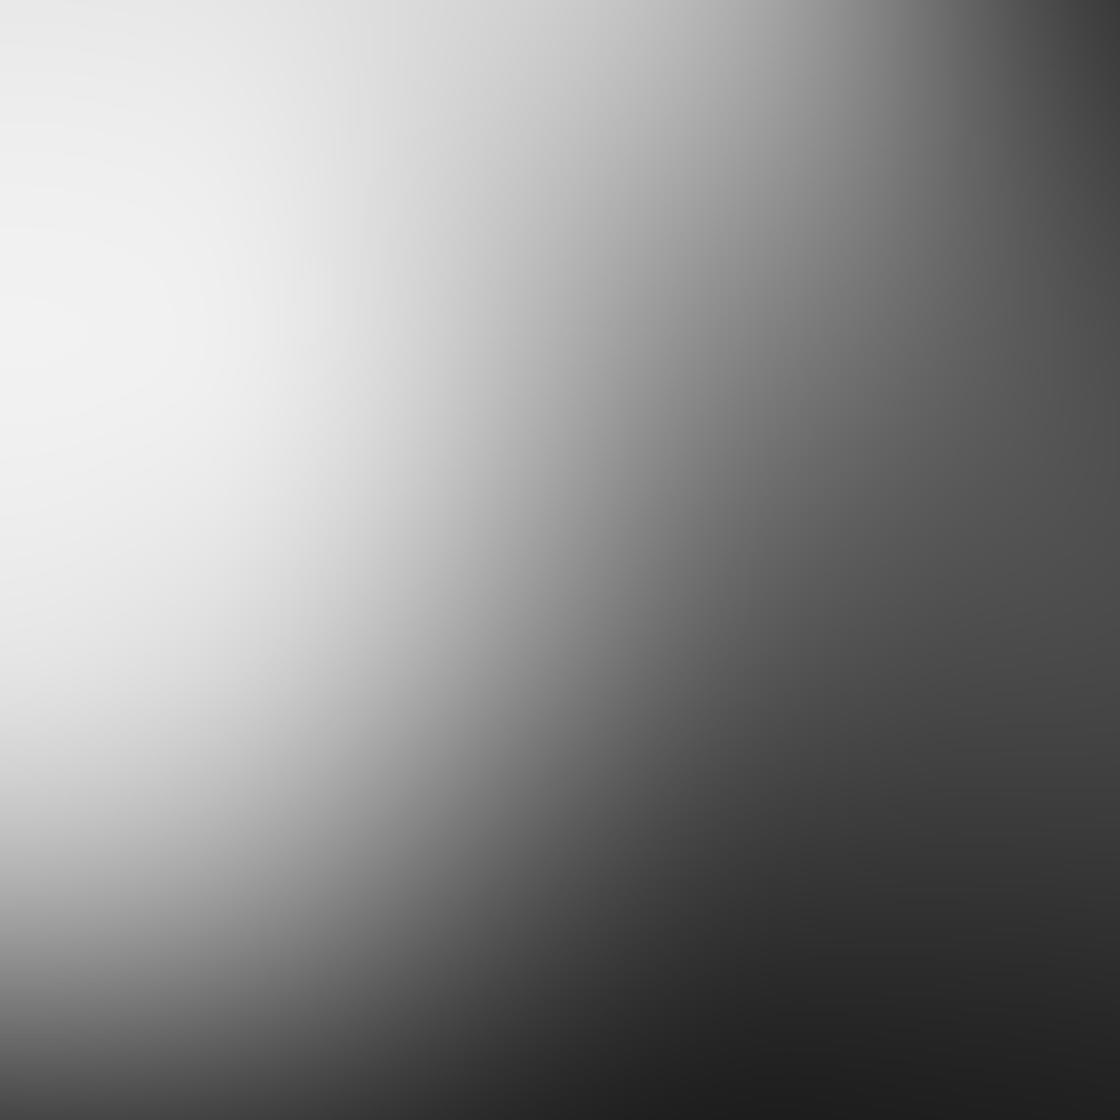 iPhone Silhouette Photos 5